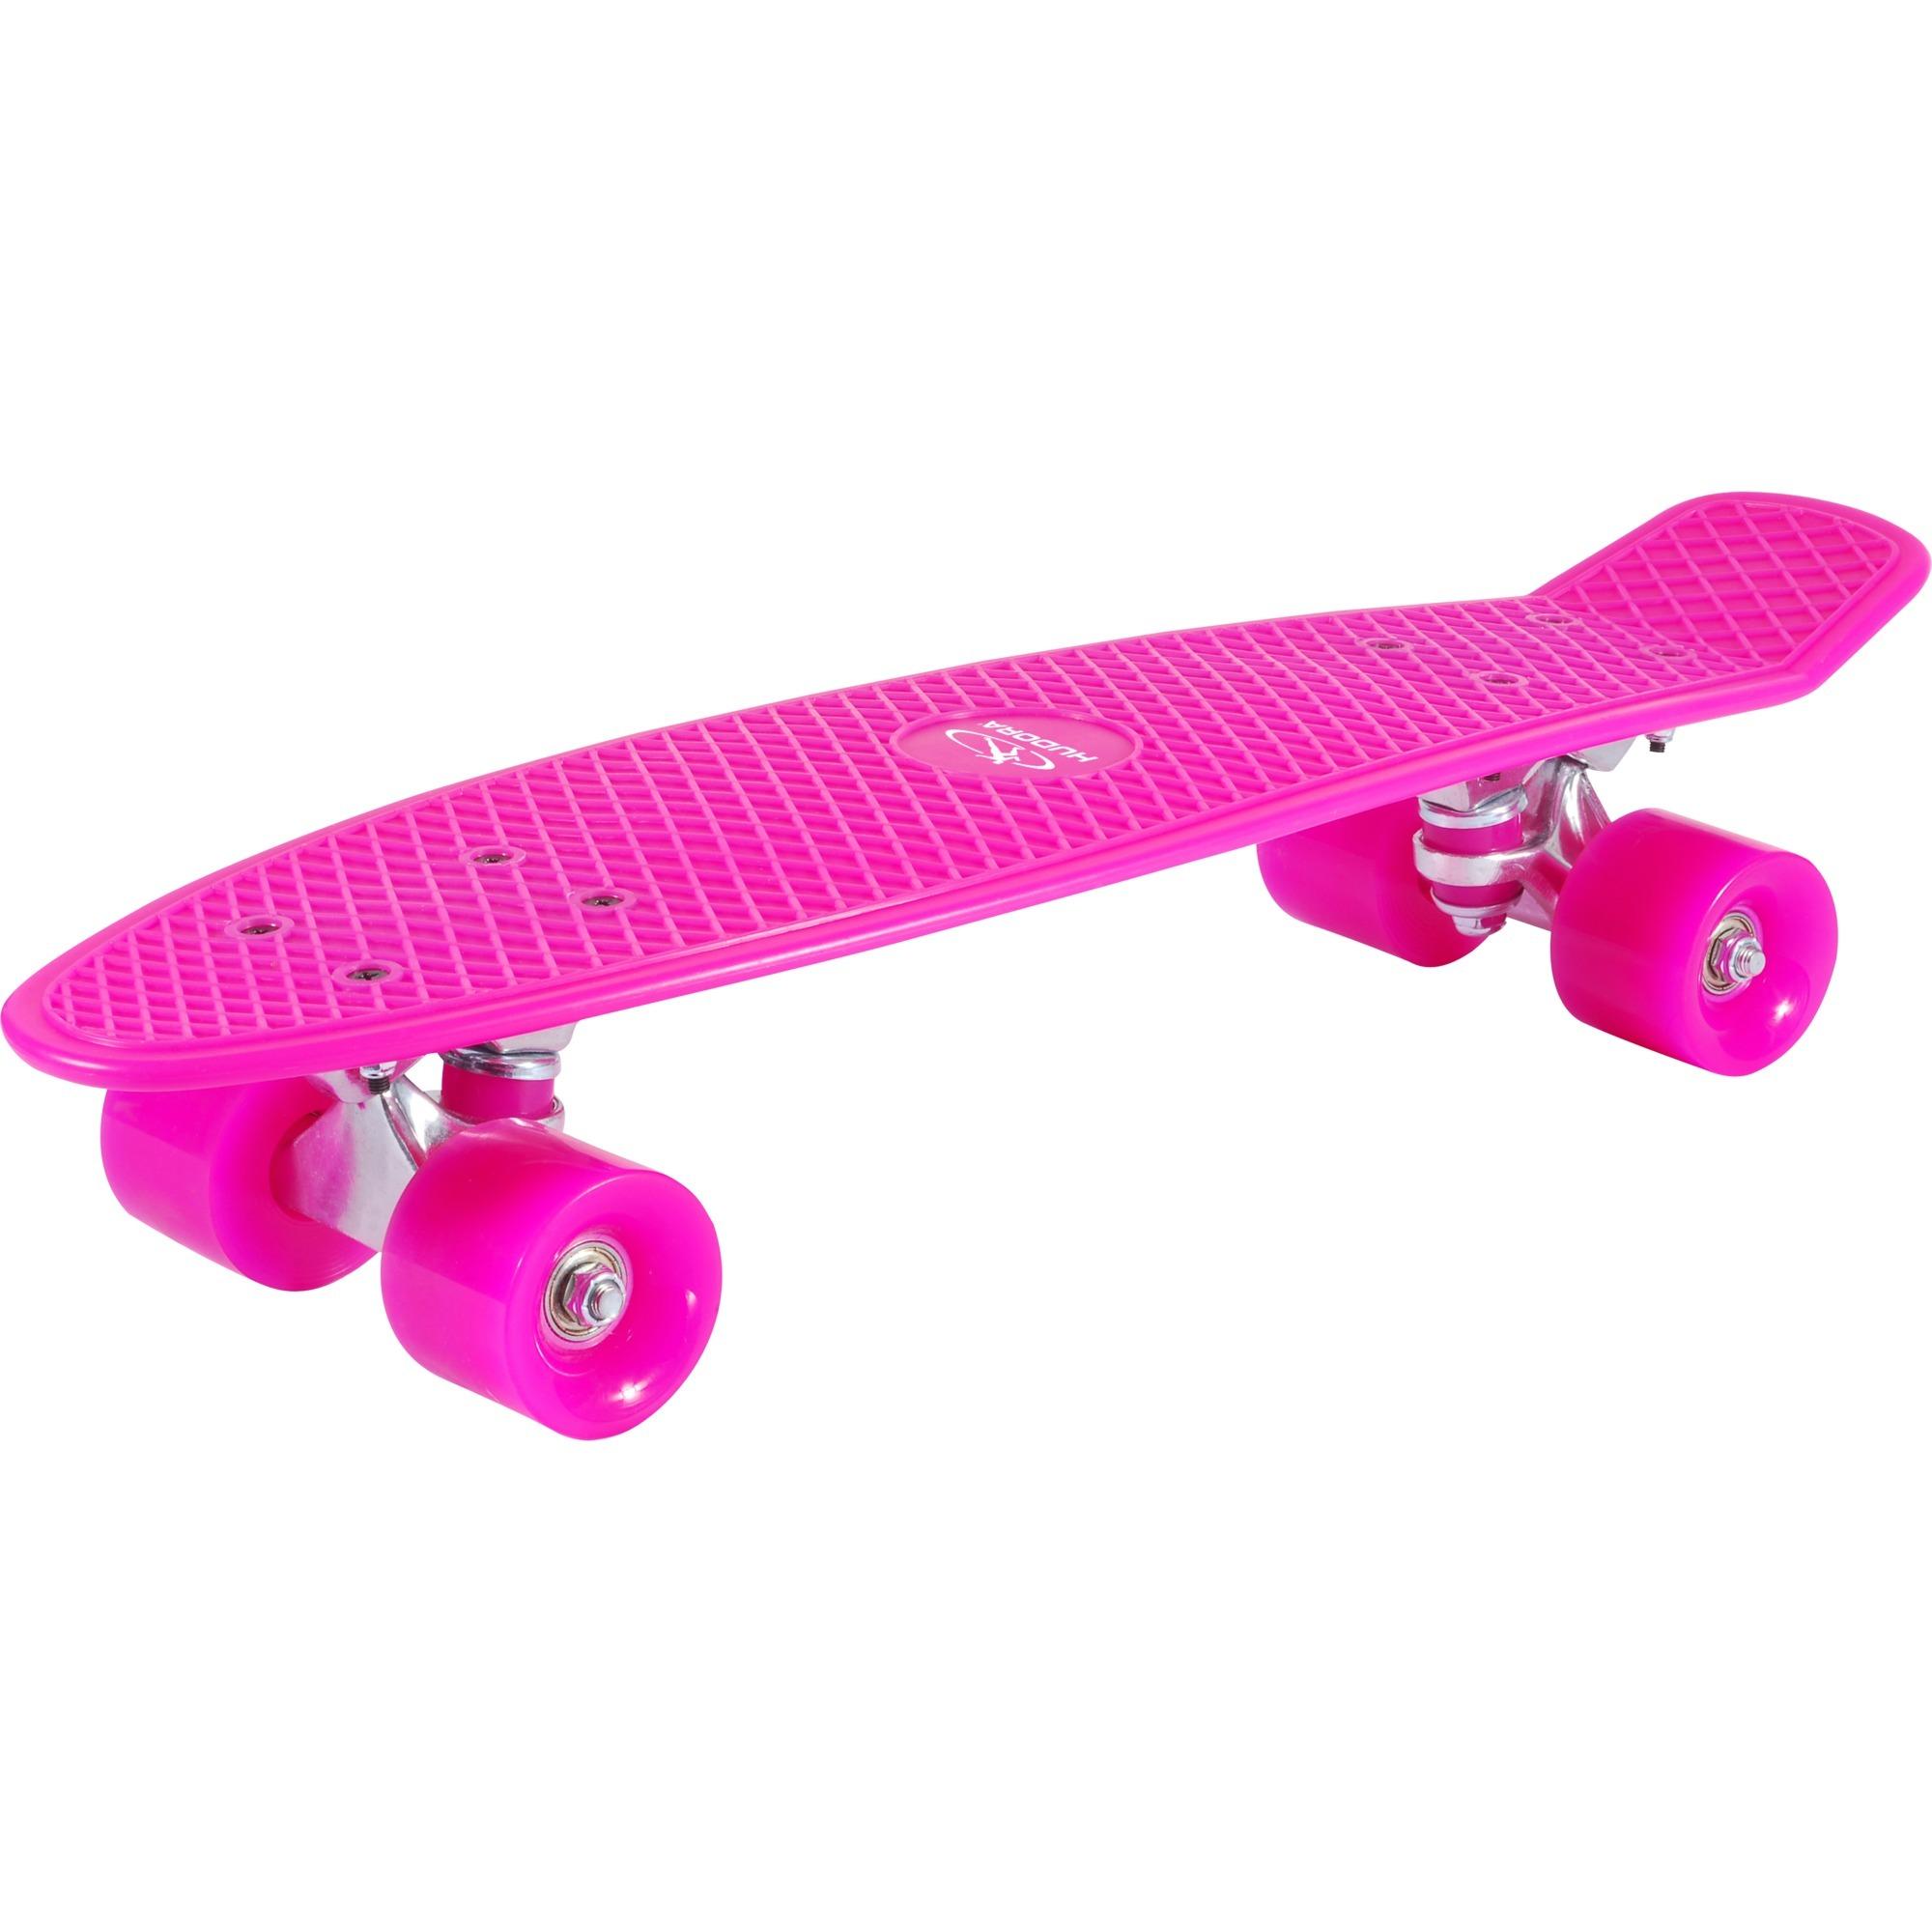 12135 Candy Board Rosa monopatín, Skateboard